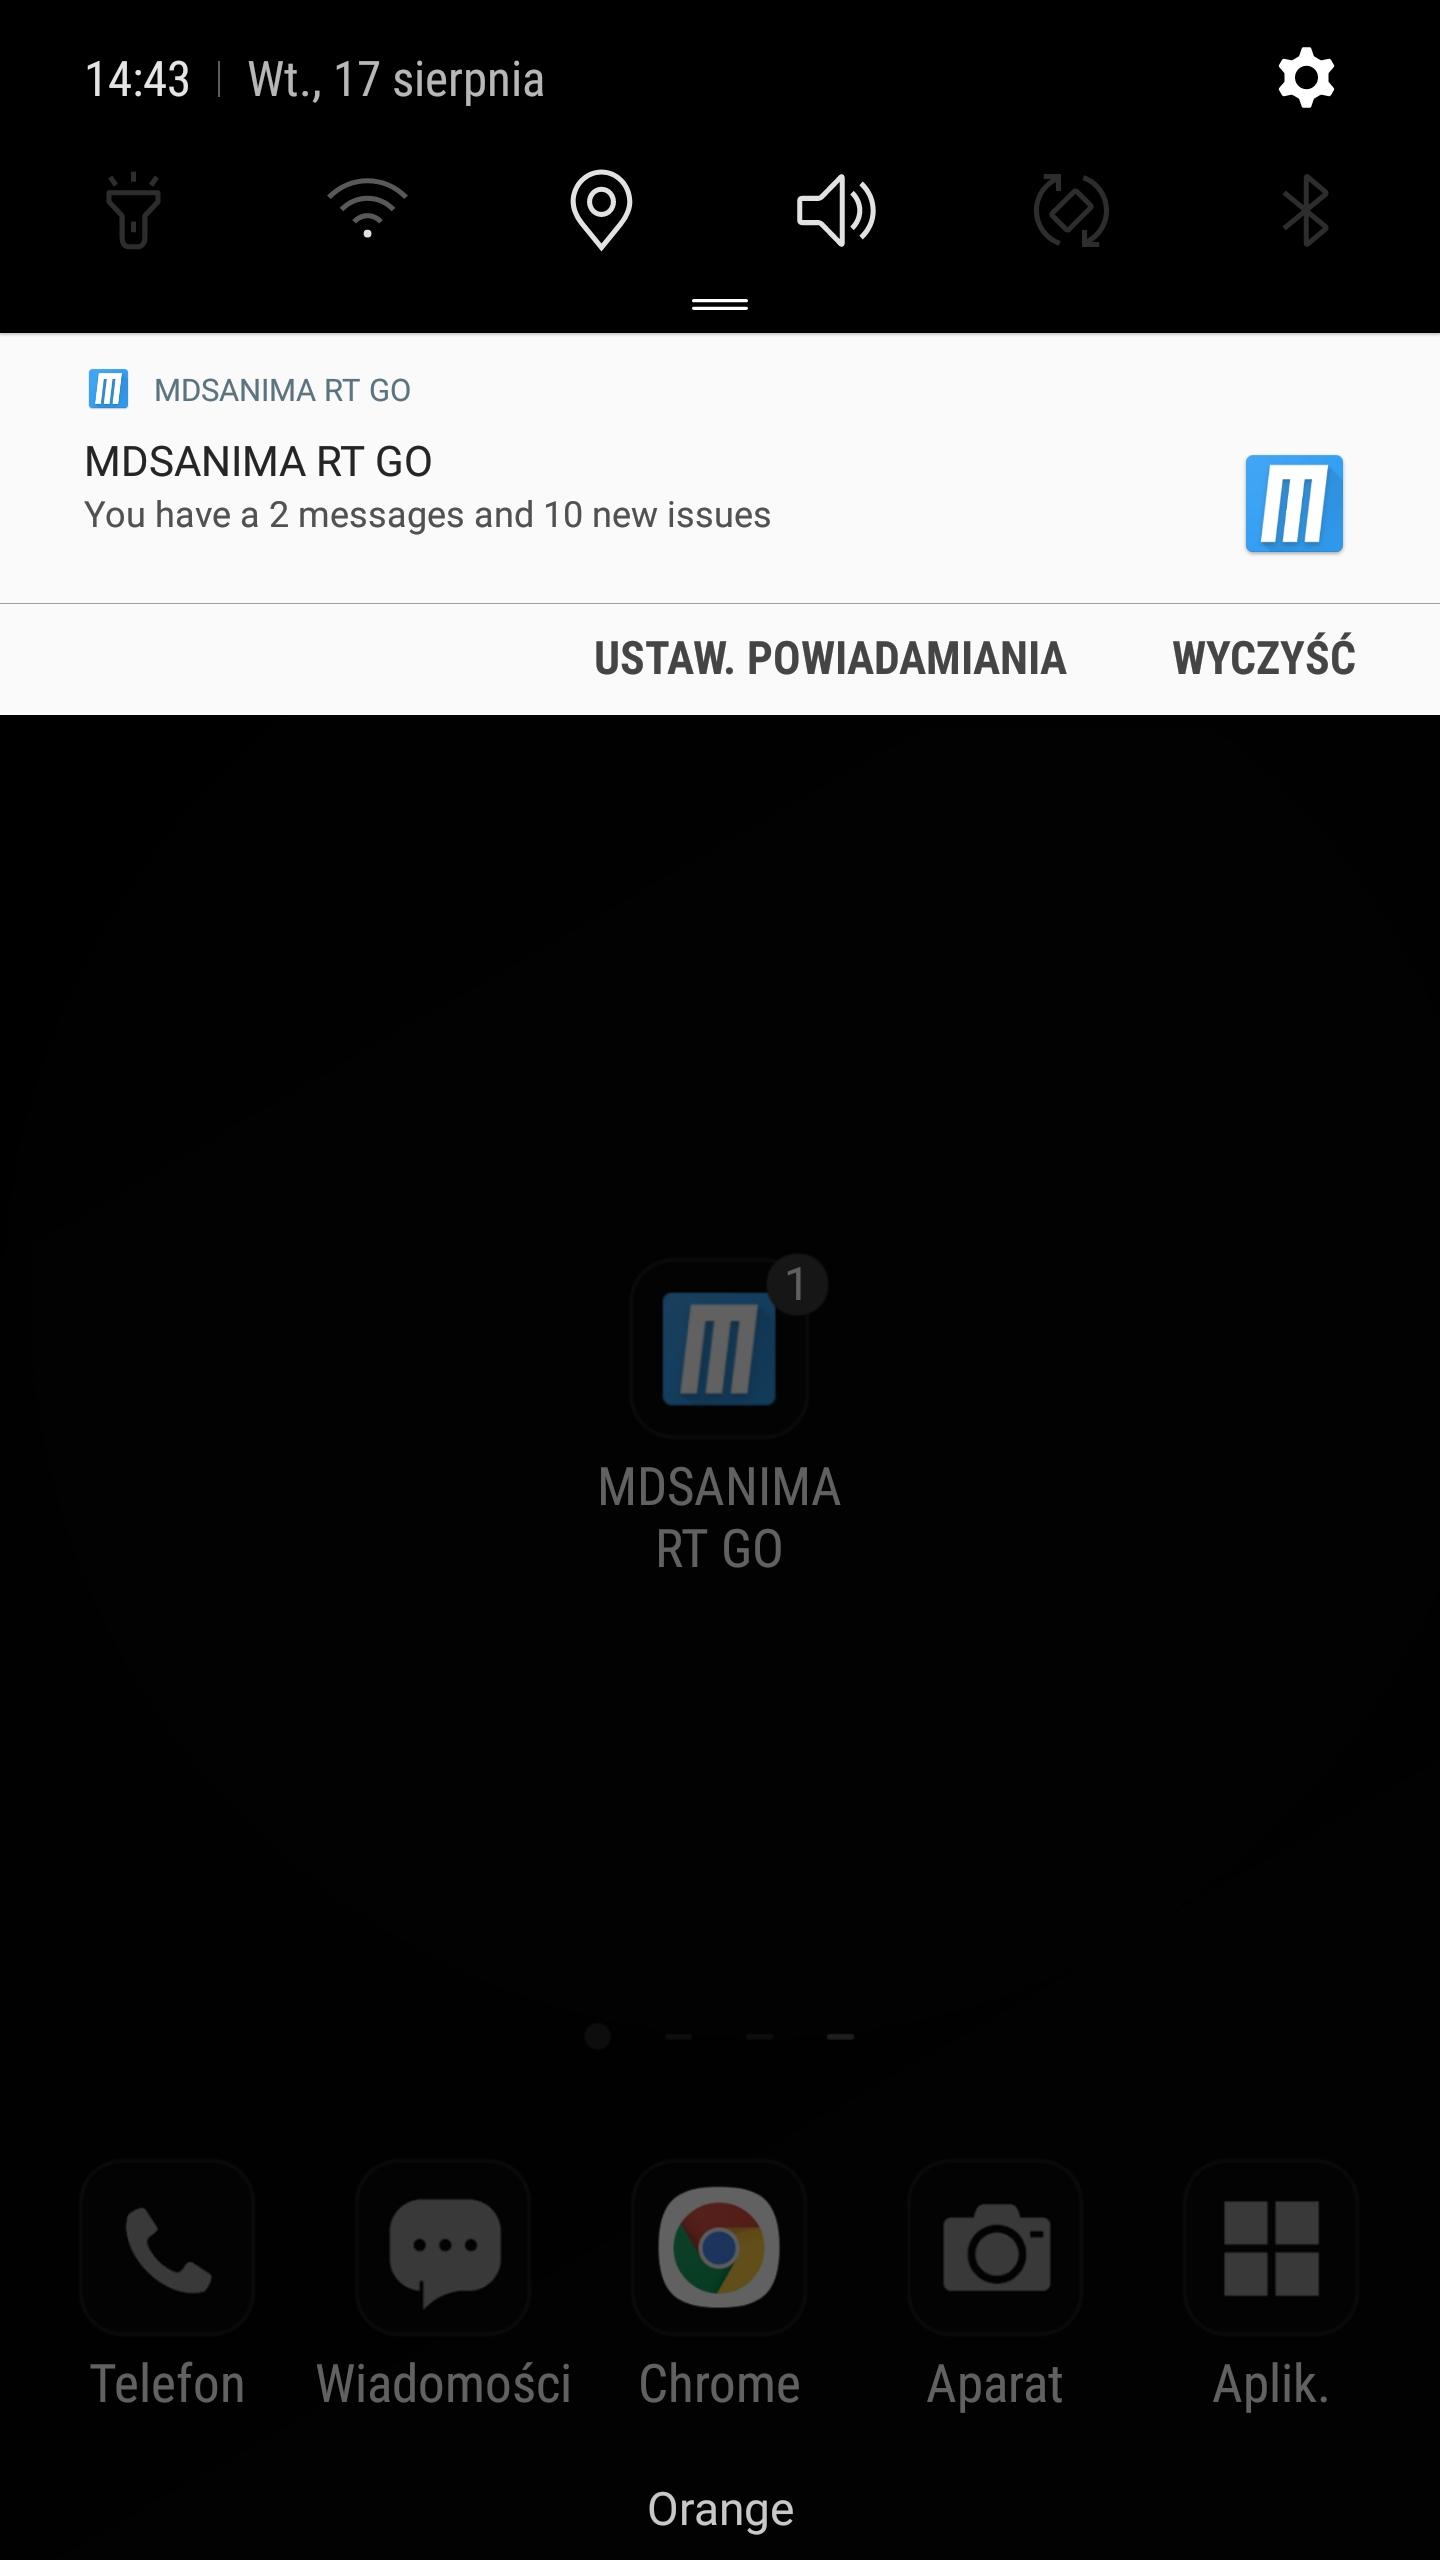 omdsanimartgo-020-armeabi-v7a-debug_samsung_s7edge_notification